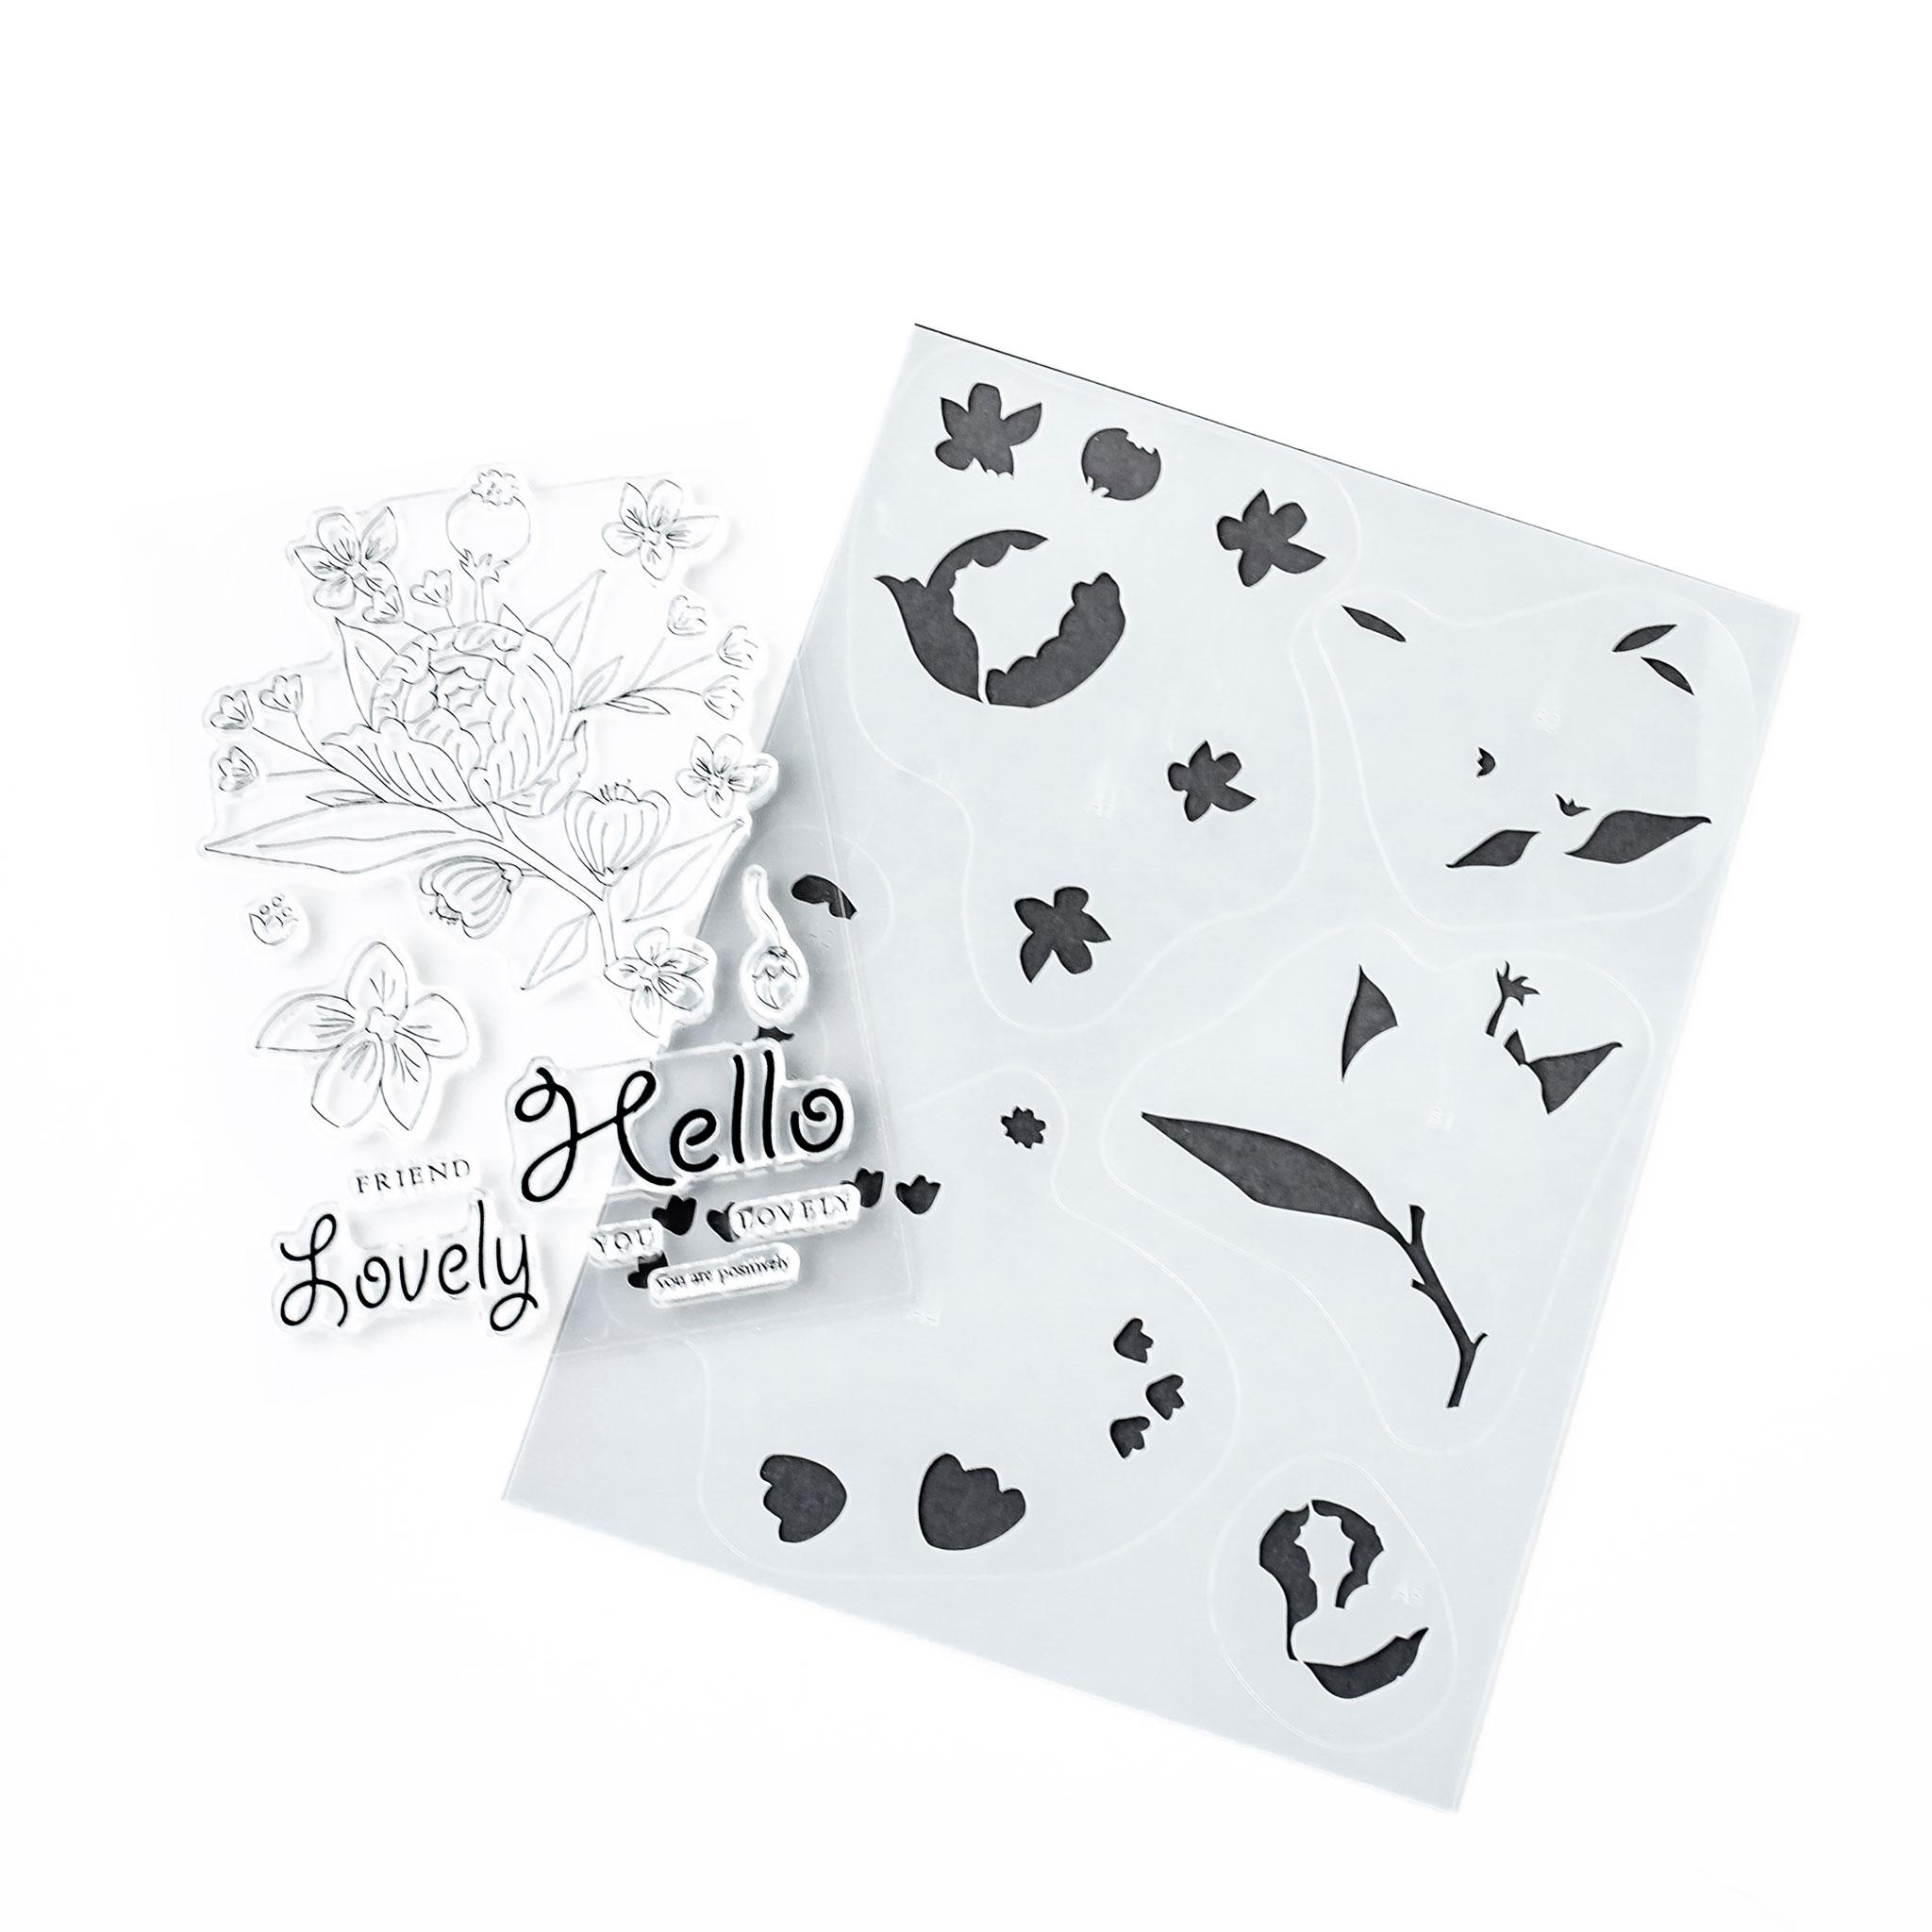 Blooming Floral Stamp and Stencil Bundle